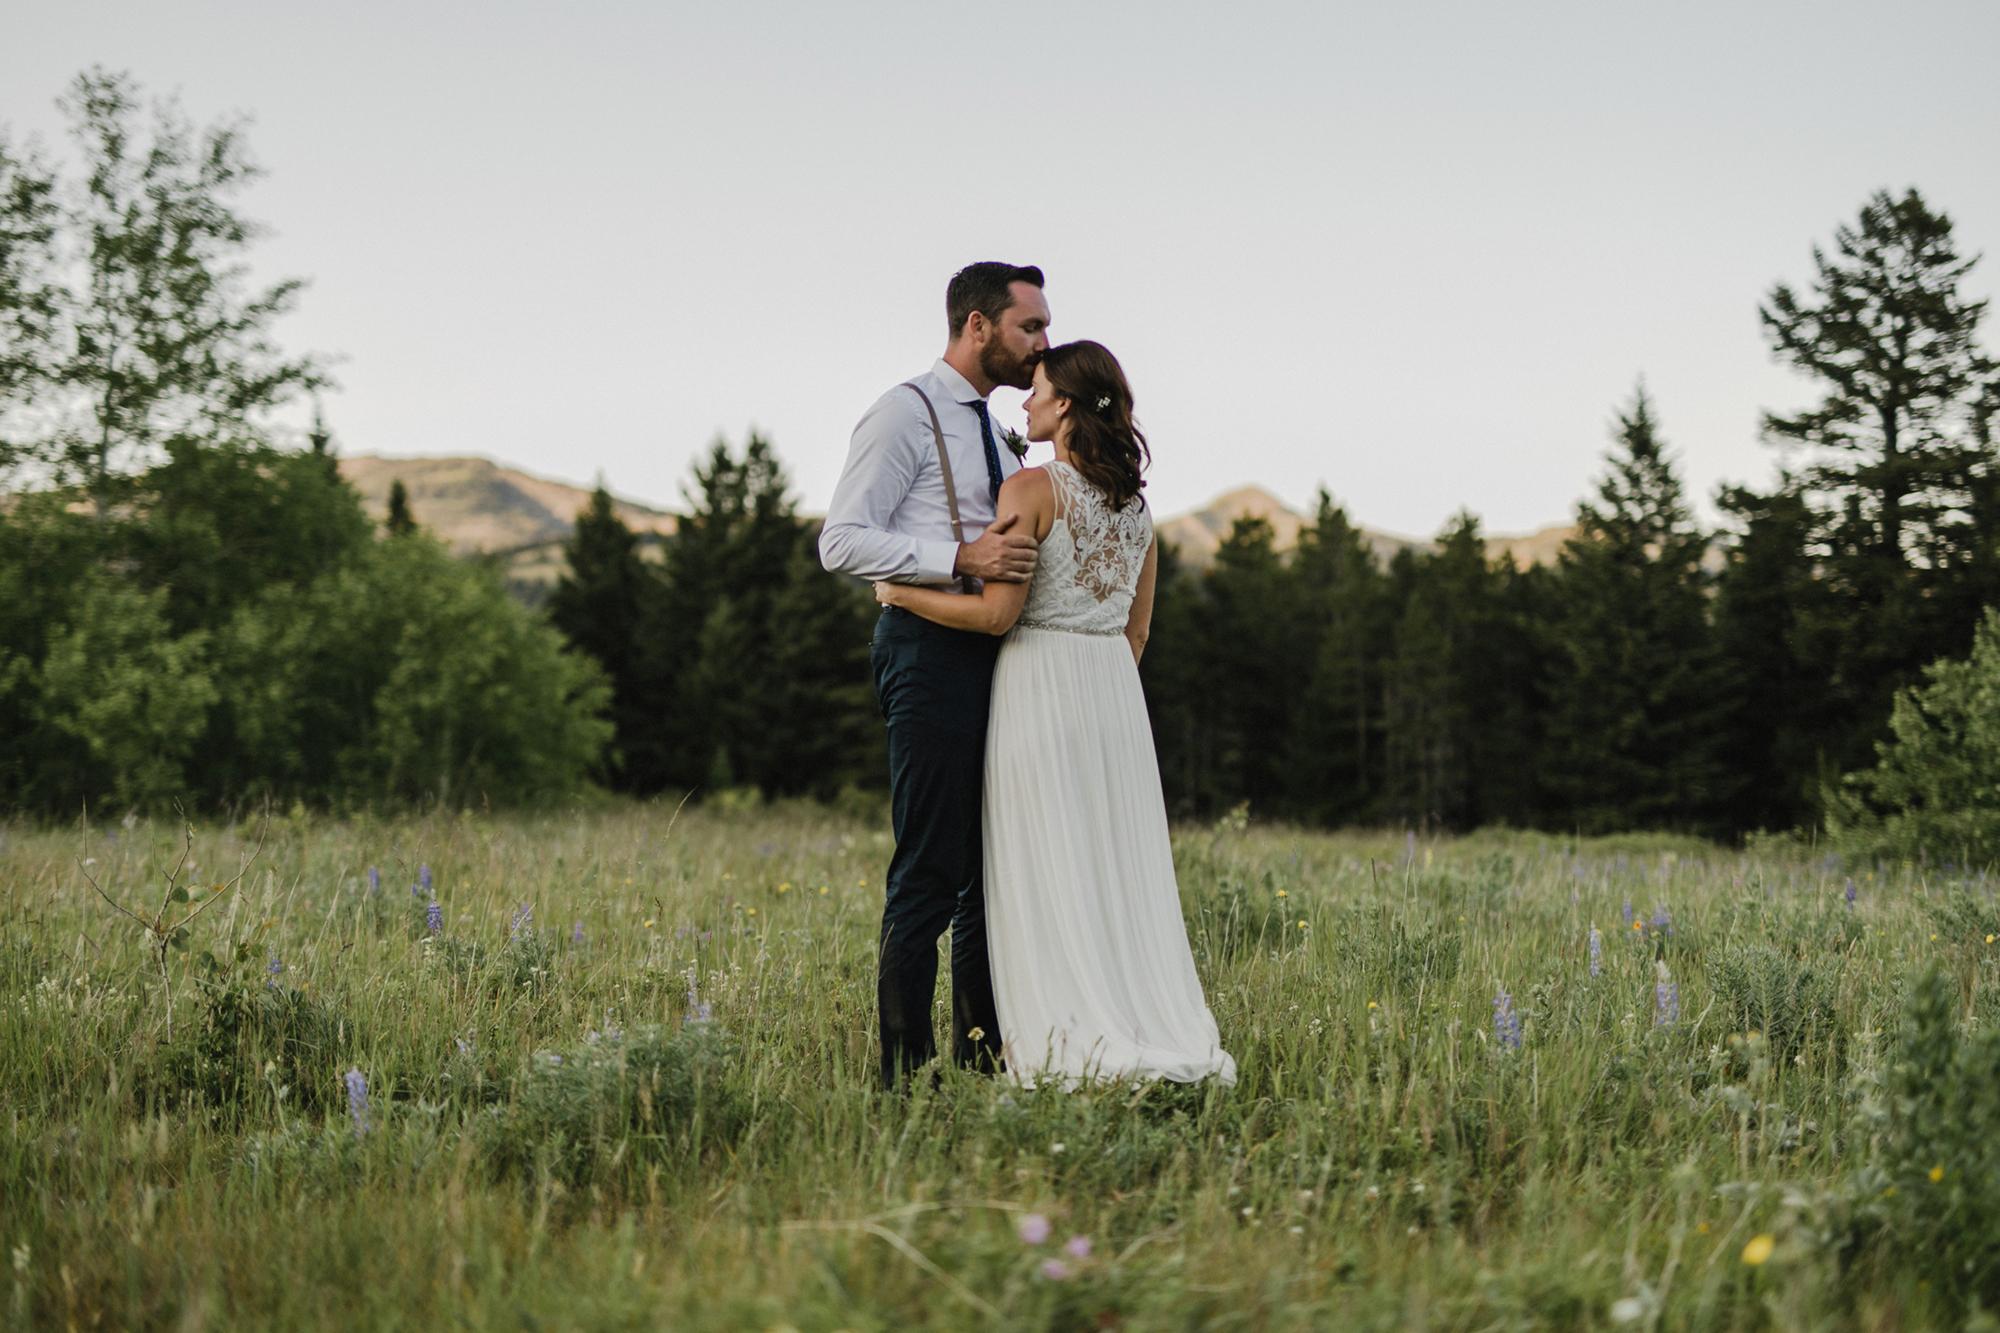 Flower Farm Crowsnest Pass Wedding -090.JPG